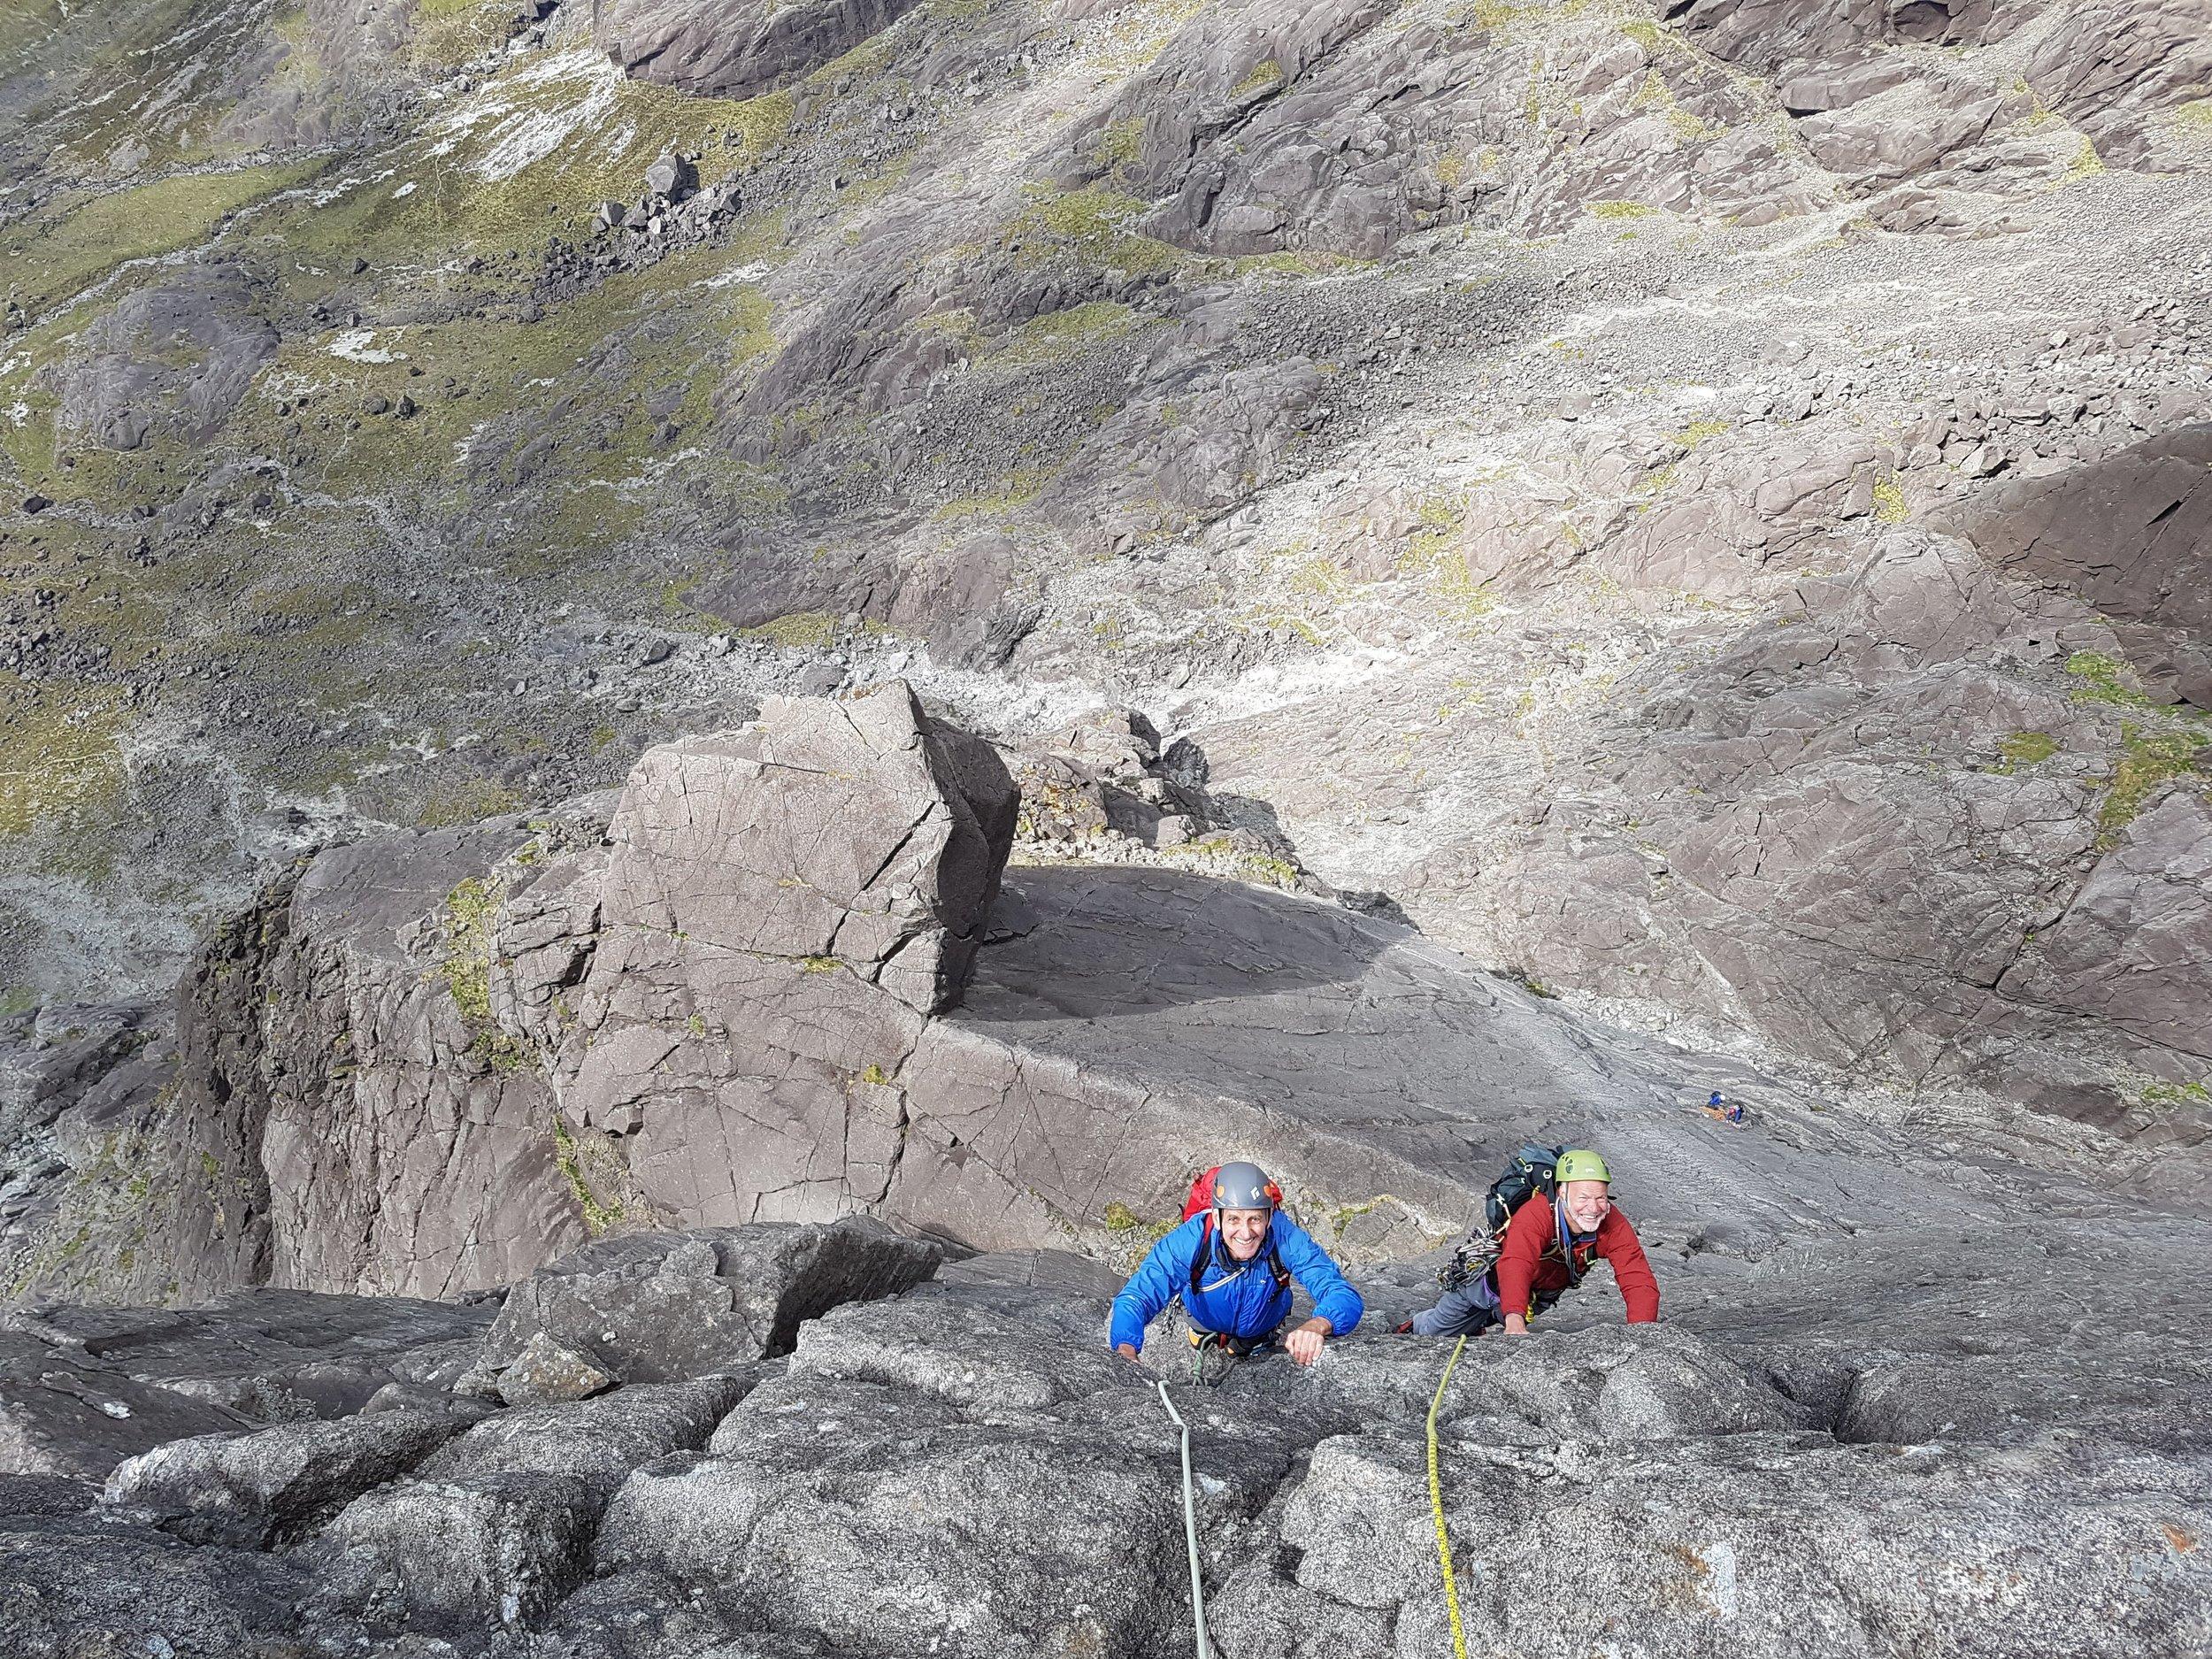 Sean & Roger climbing Integrity (VS) on the Isle of Skye